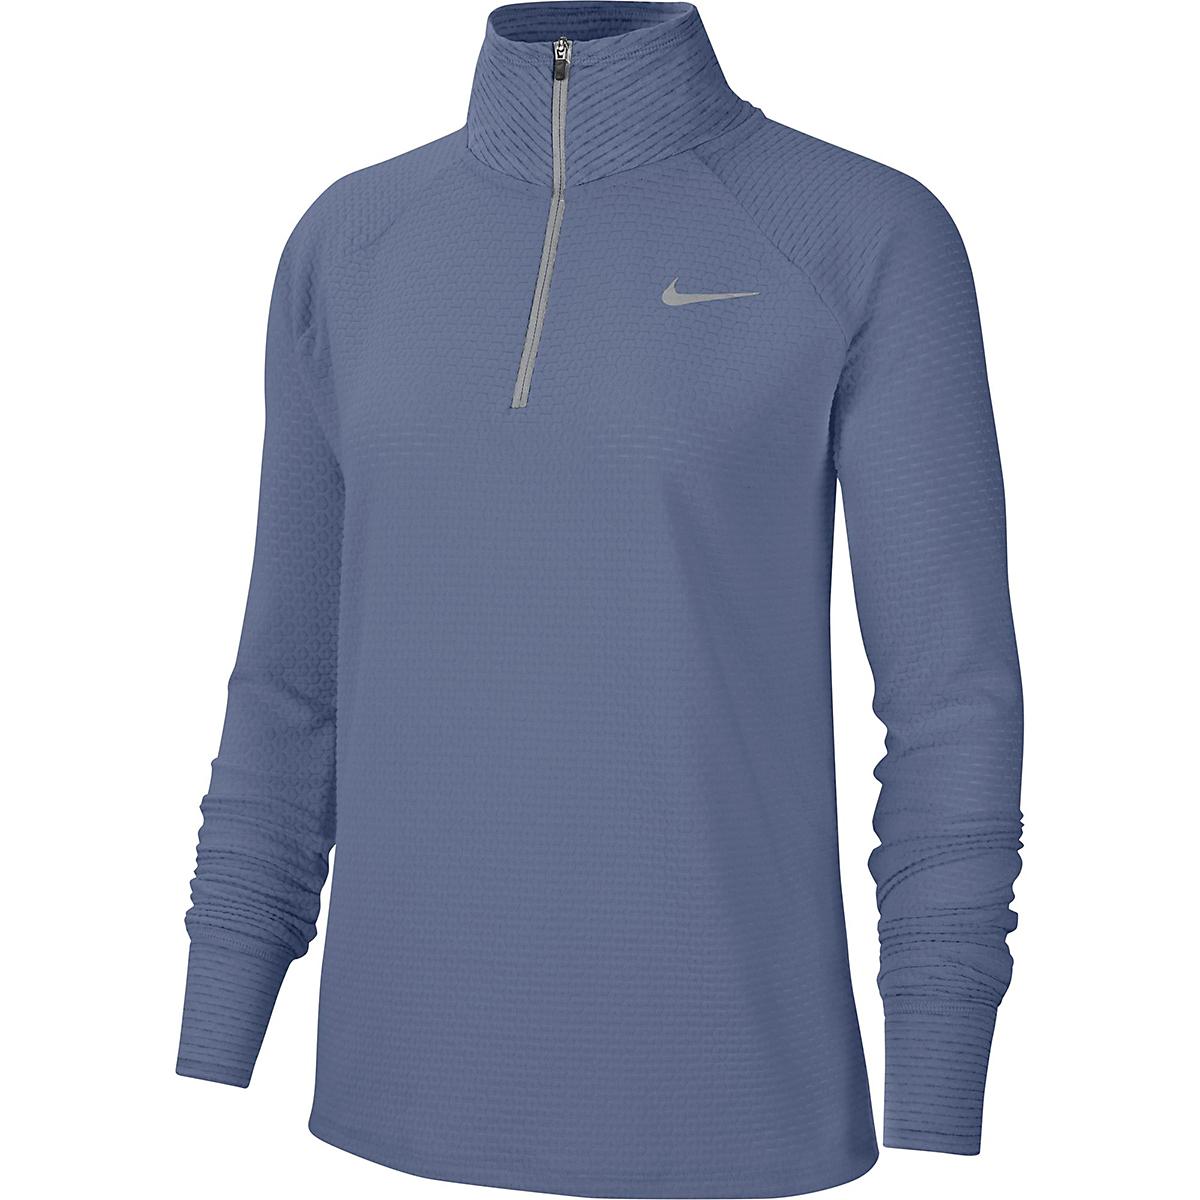 Women's Nike Sphere Half Zip Long Sleeve Shirt - Color: World Indigo/Reflective Silver - Size: XS, World Indigo/Reflective Silver, large, image 1